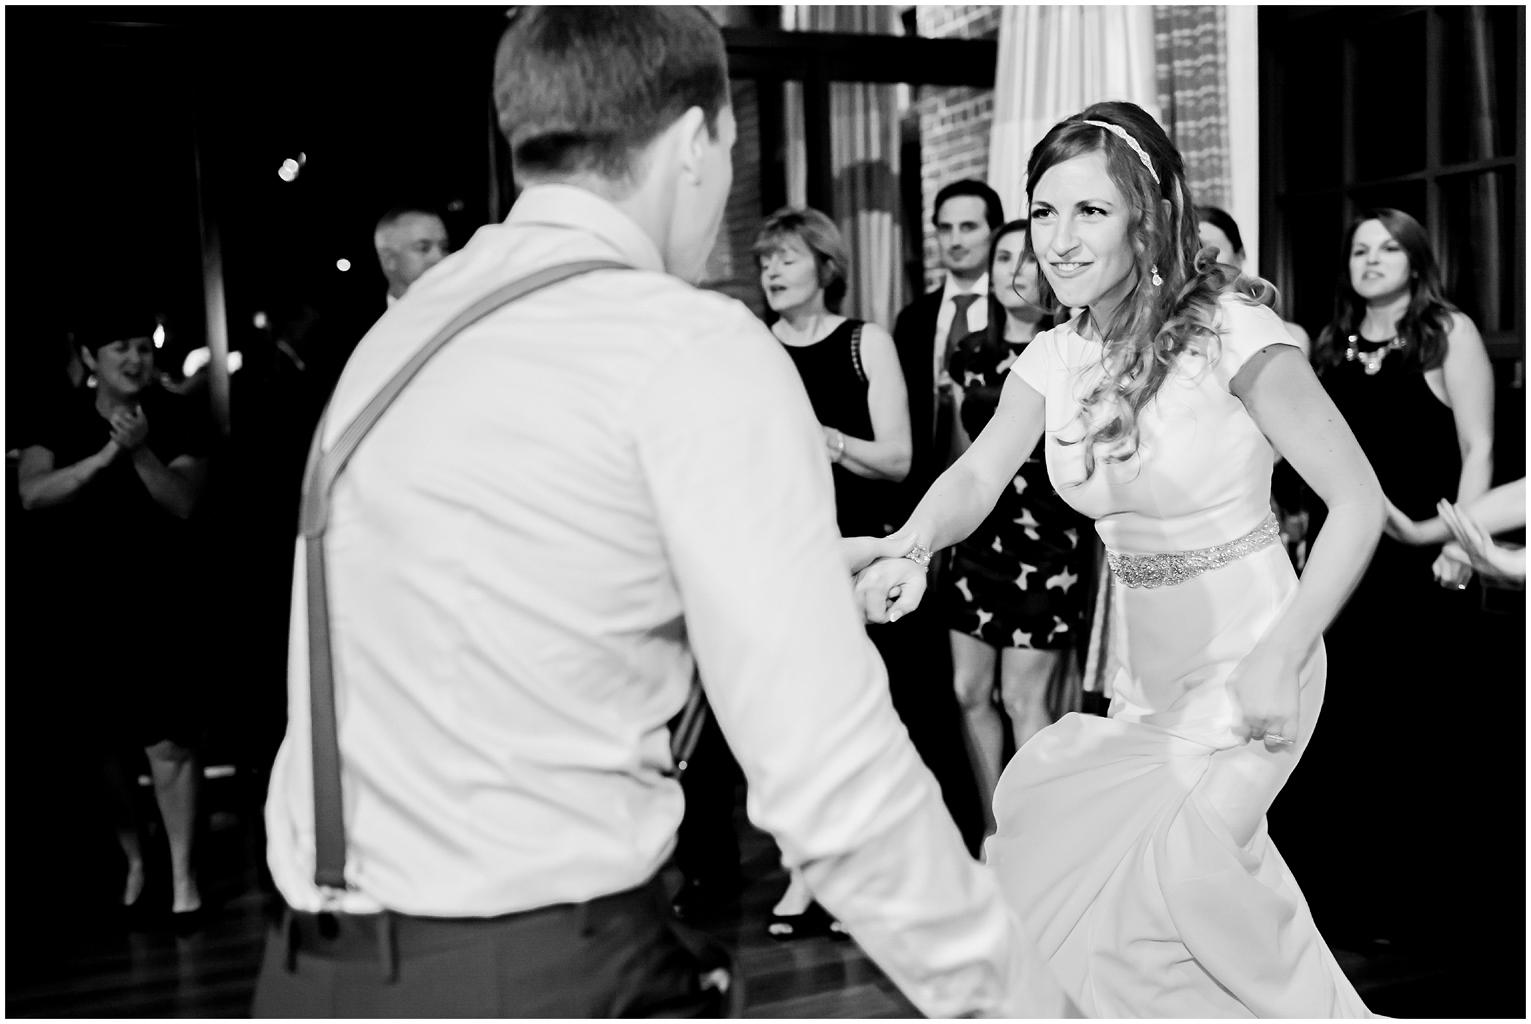 ritz-carlton-georgetown-wedding-washington-dc-photography-liz-stewart-photo-00056